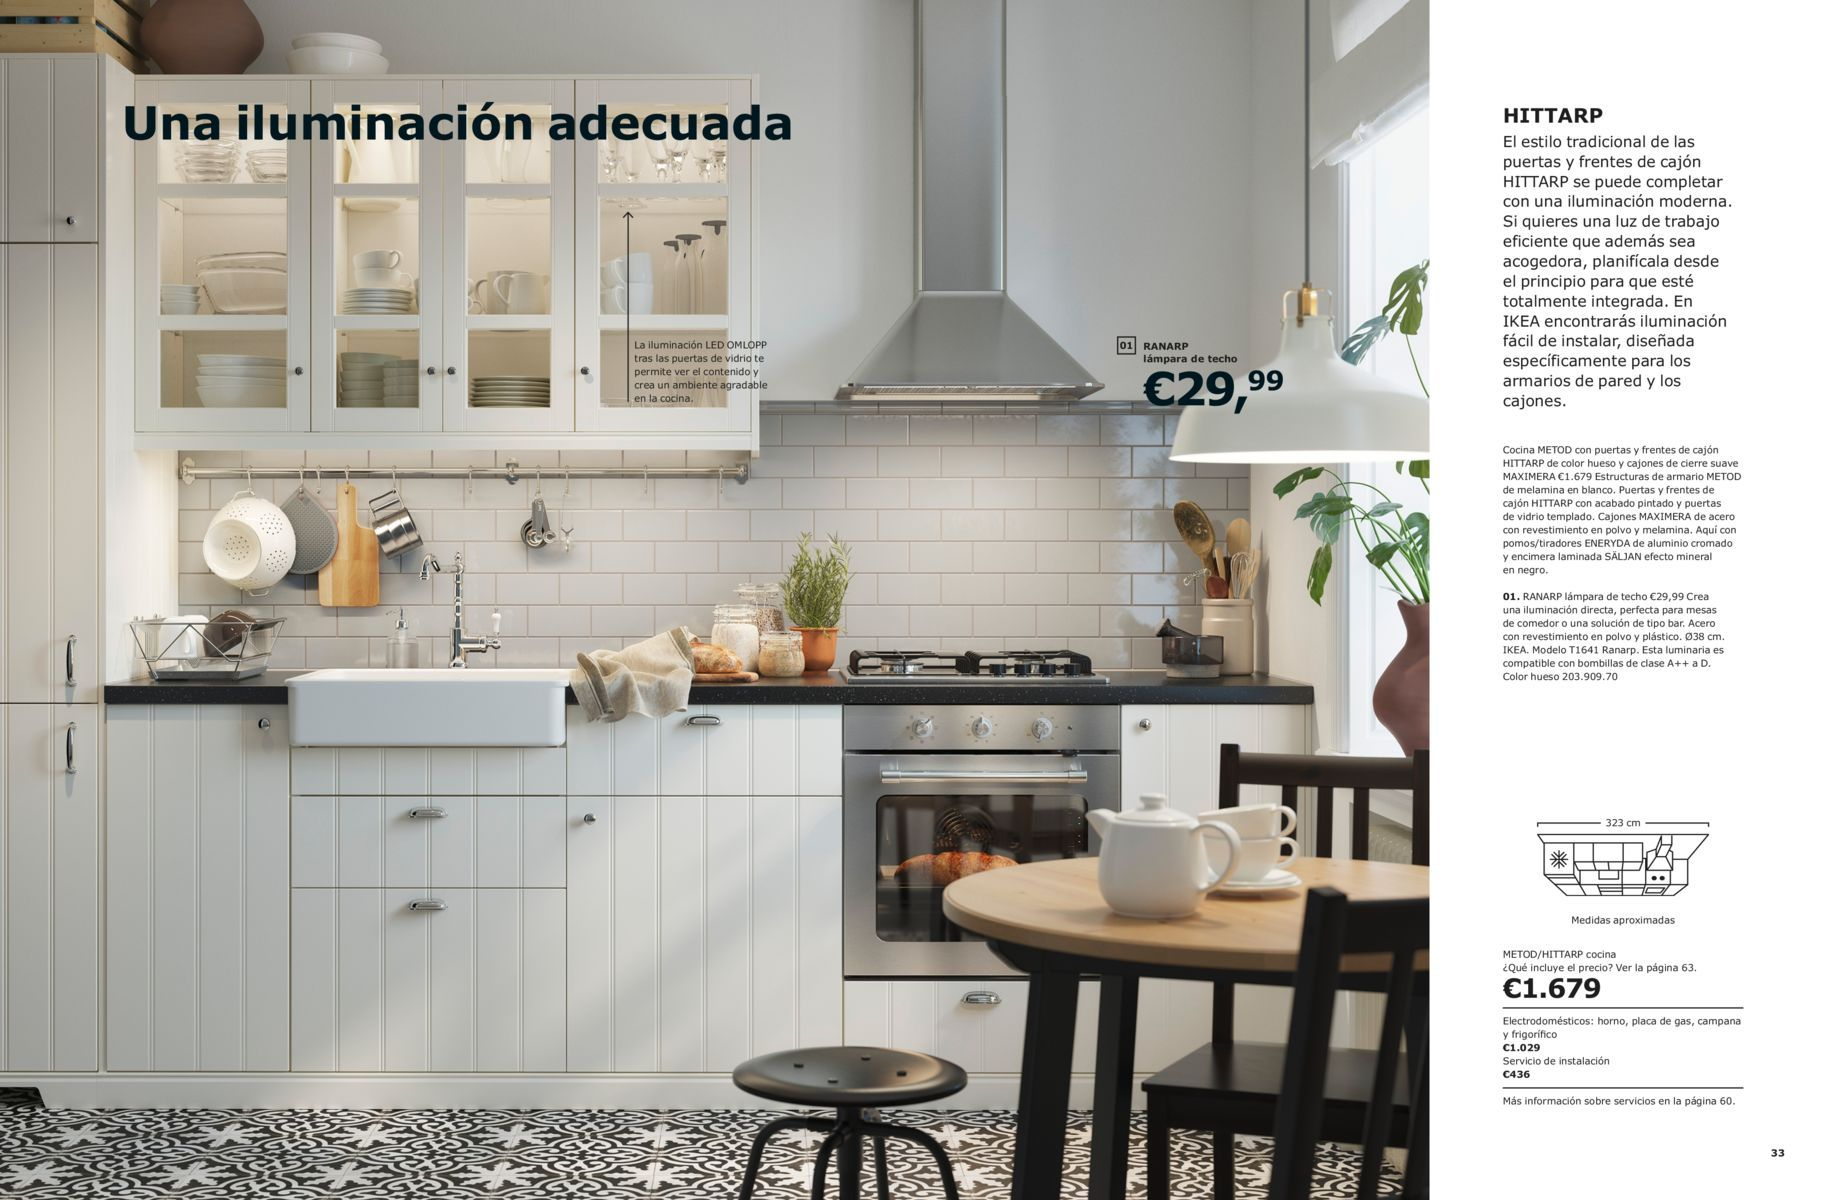 Elegir La Iluminación Adecuada Catàleg De Cuines 2019 Portable Kitchen Island Modern Kitchen Cupboards Ikea Kitchen Design